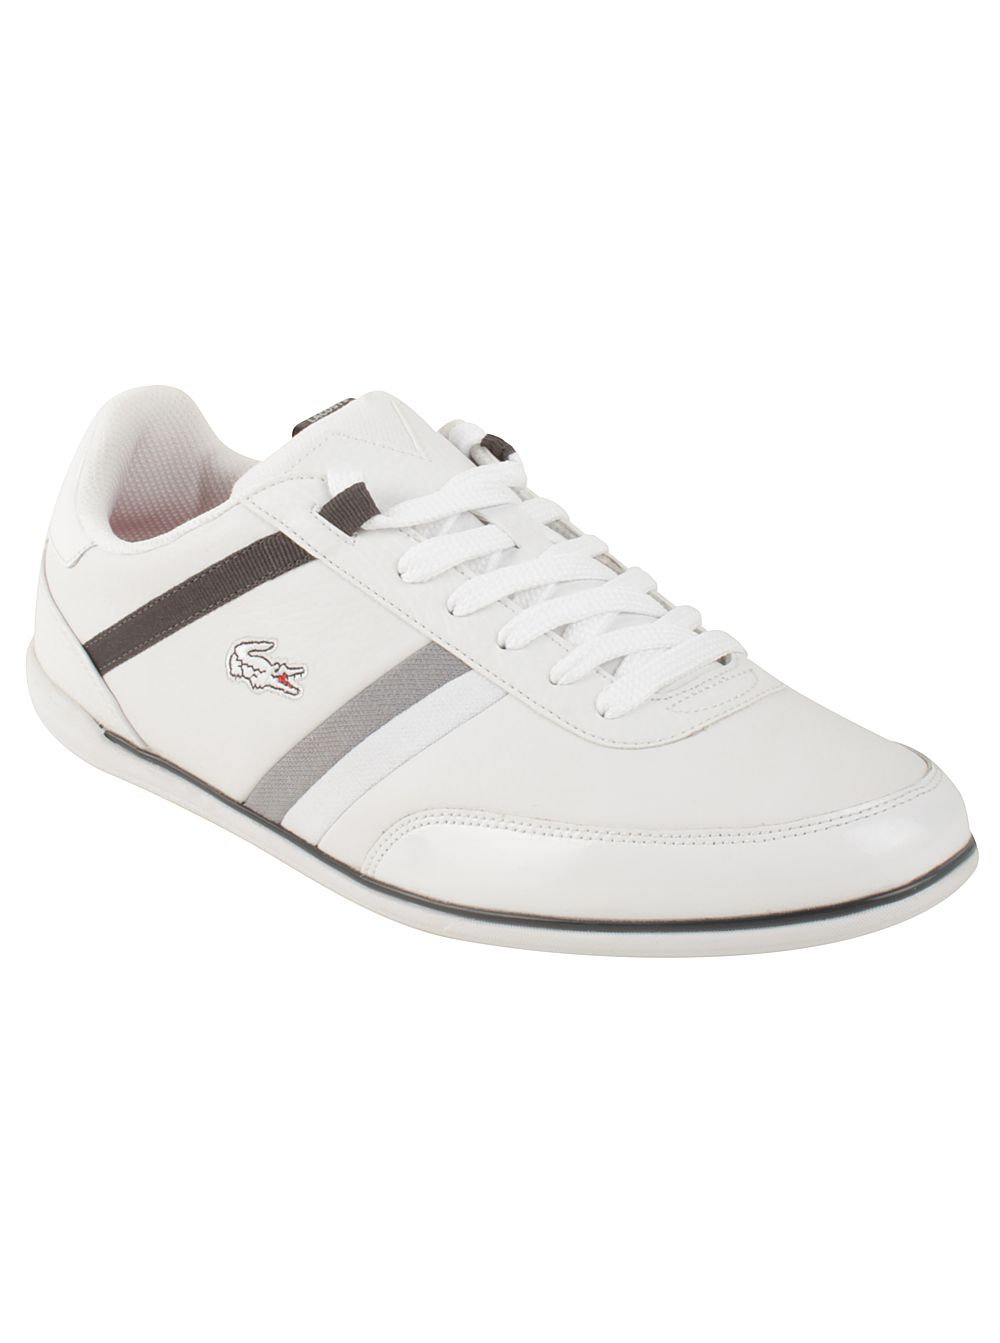 657715202 Lacoste Men s Giron in White Dark Grey Fresh in style and clean in design